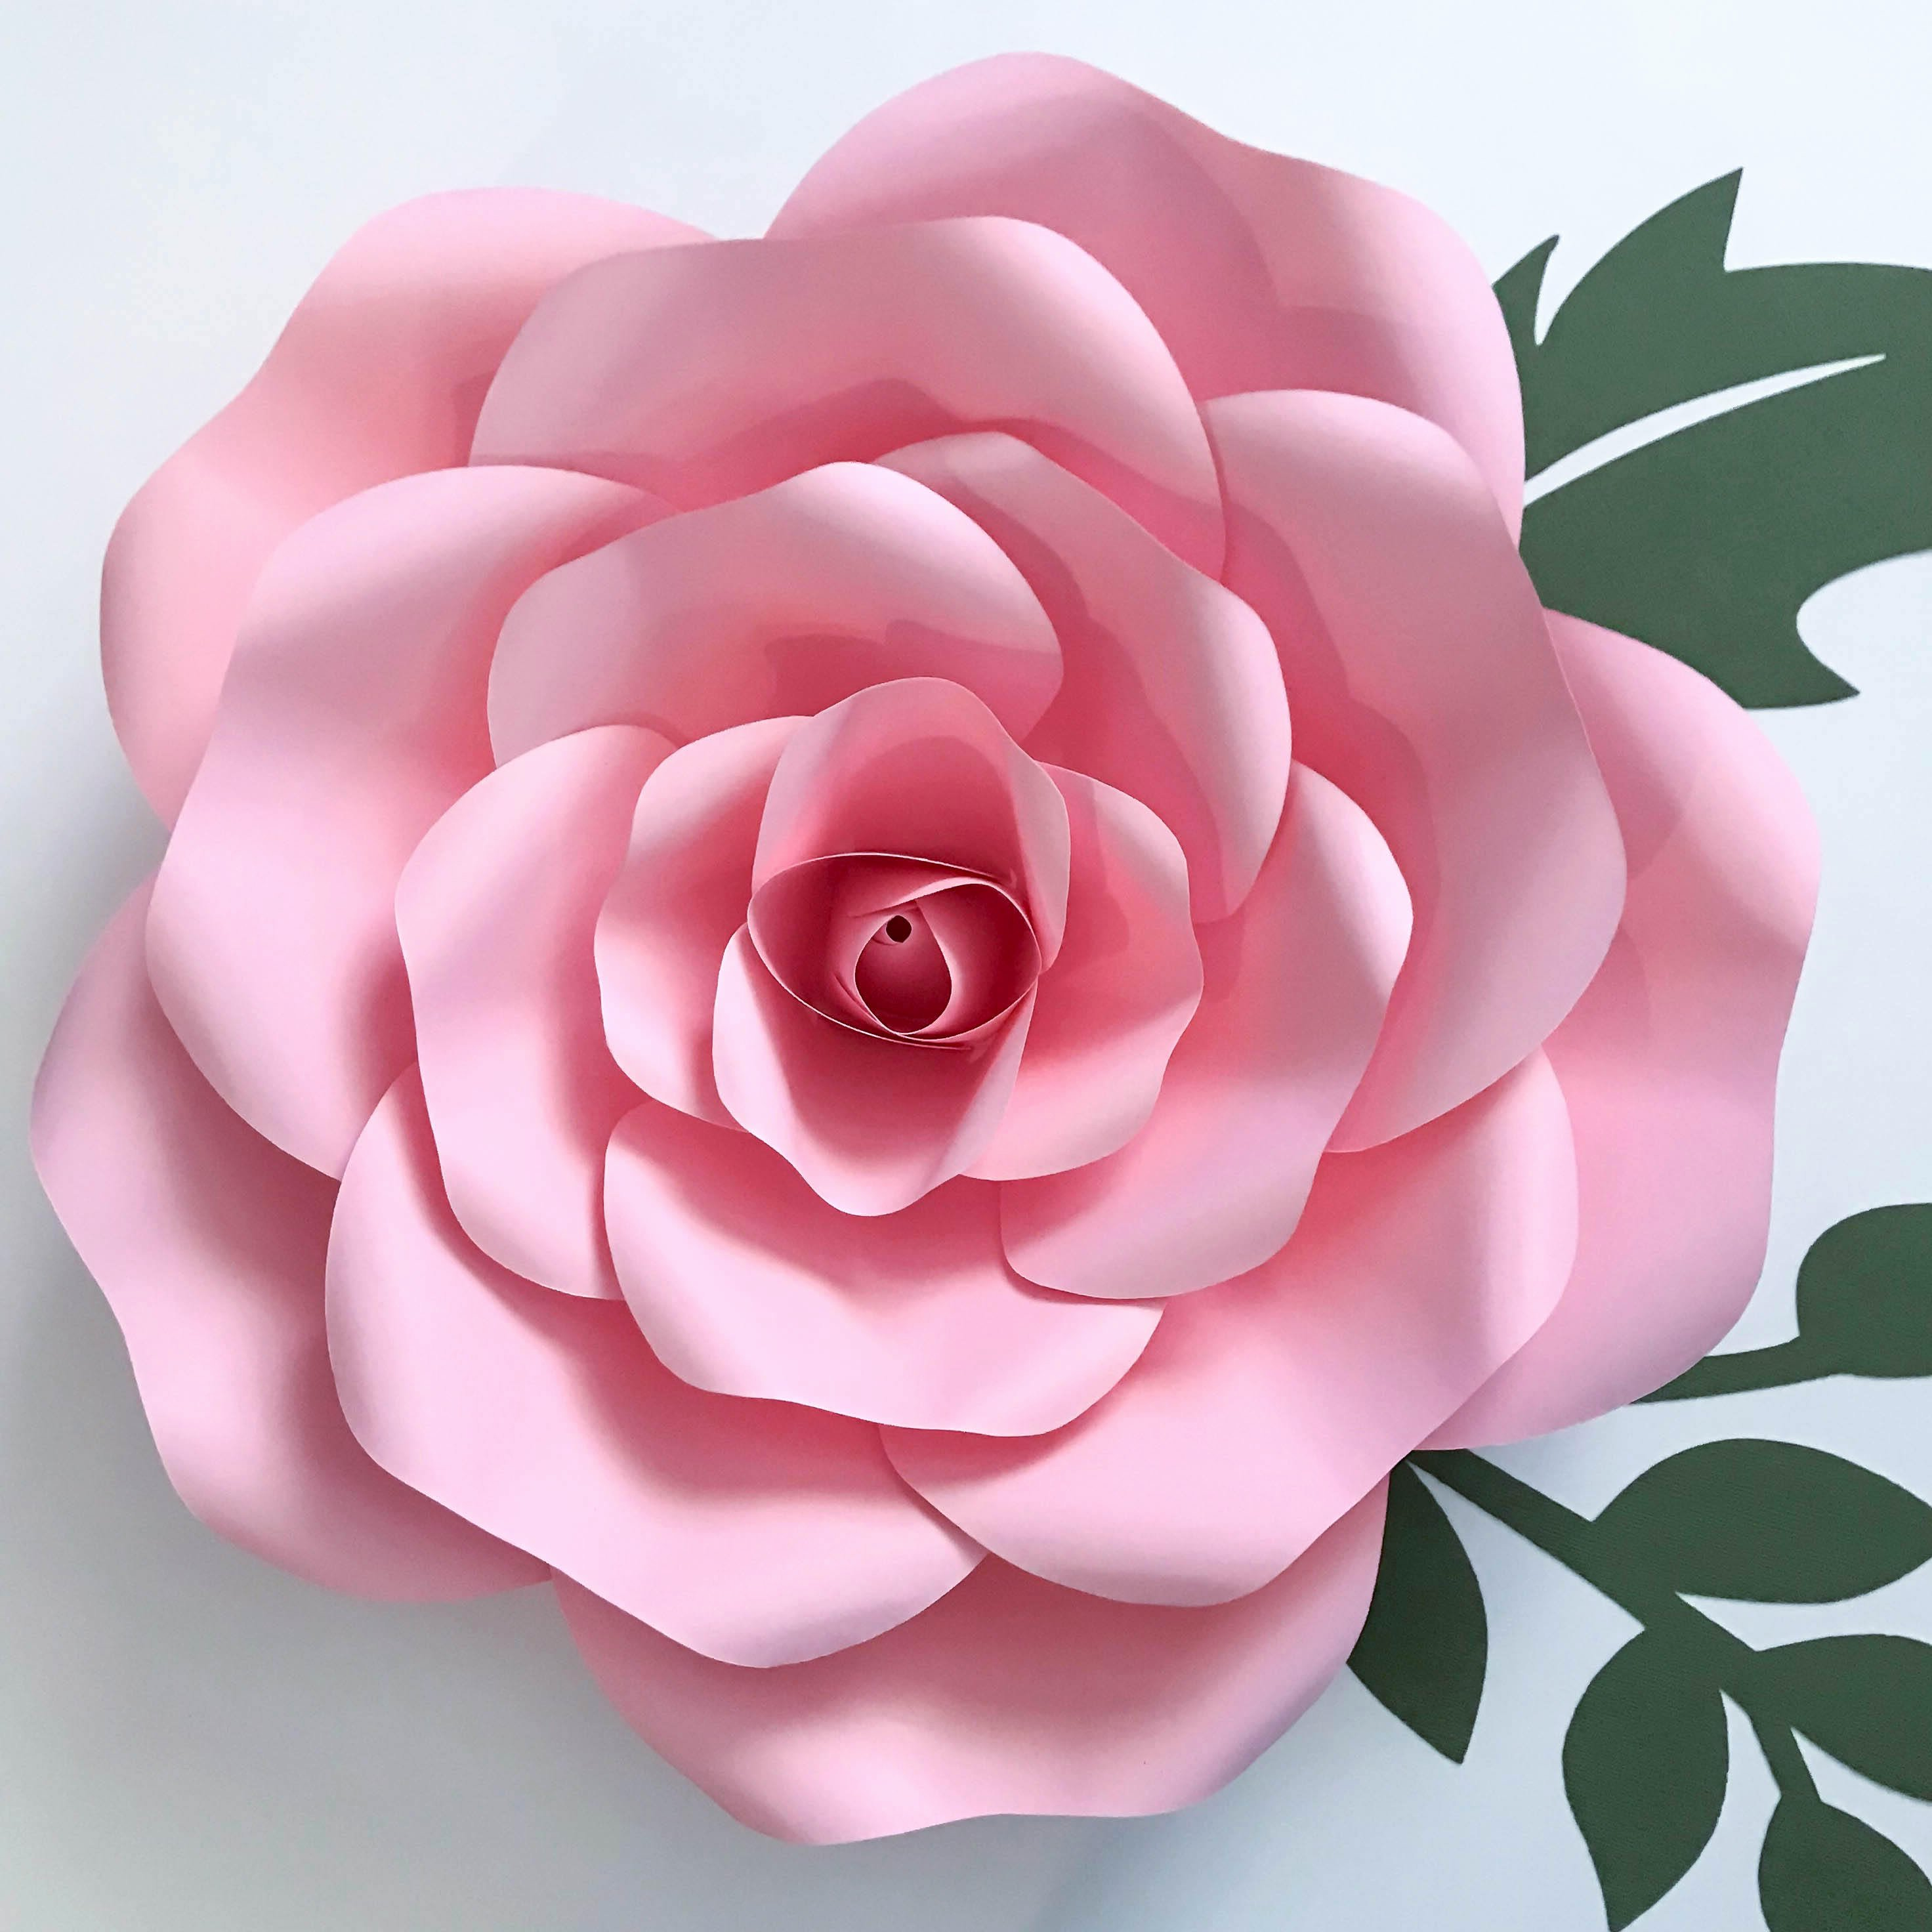 Paper Flower Petal Template Best Of Paper Flowers Paper Flowers Svg Petal 155 Template for